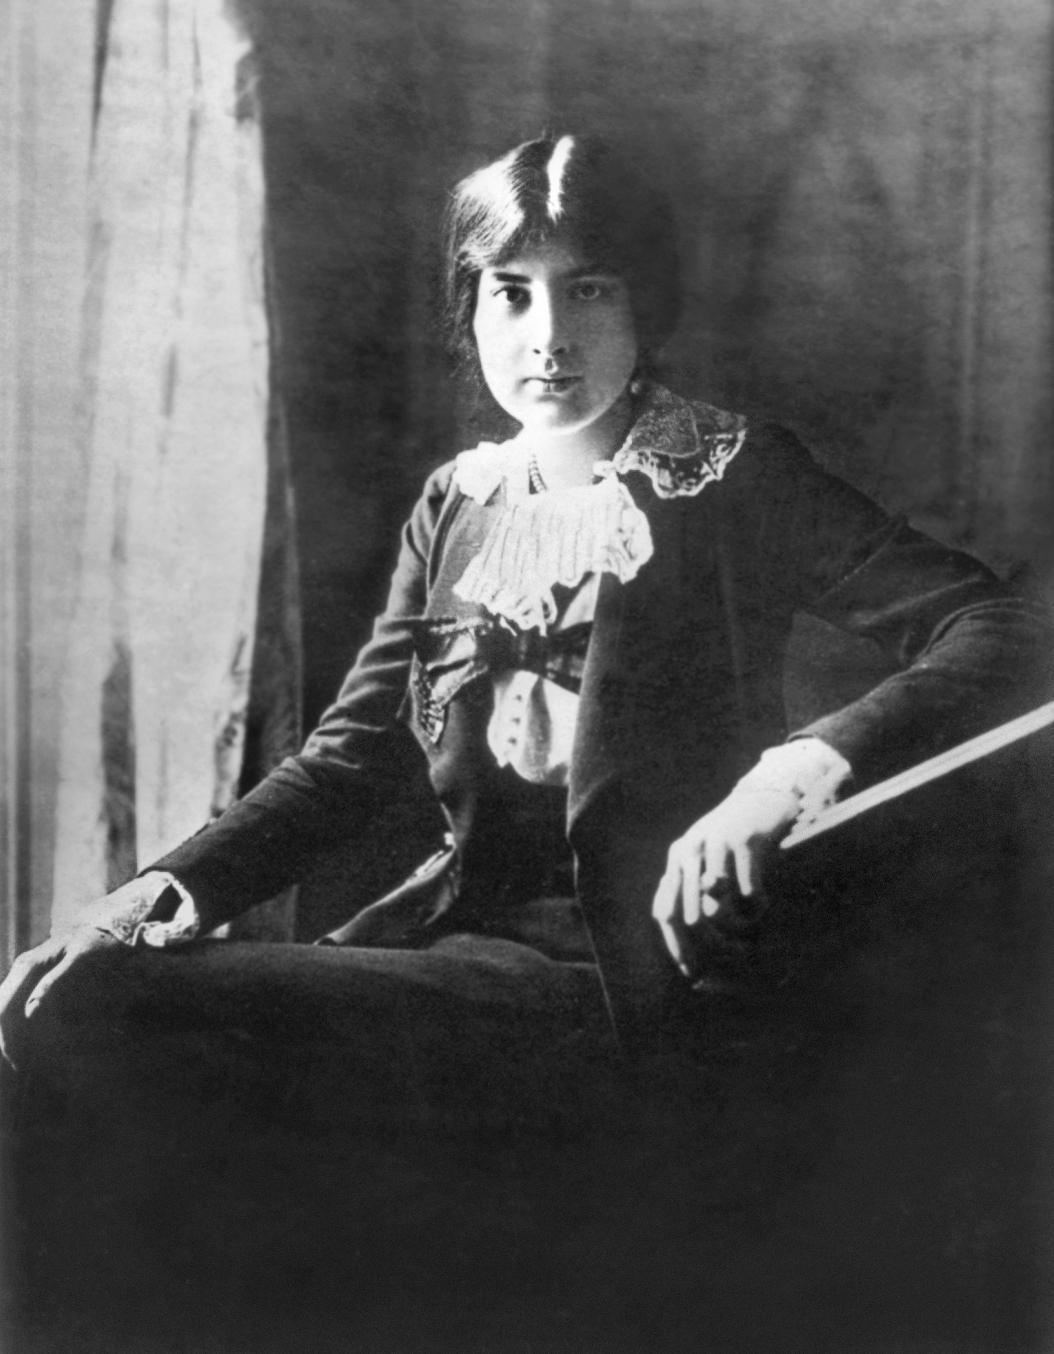 Lili boulanger wikimedia commons